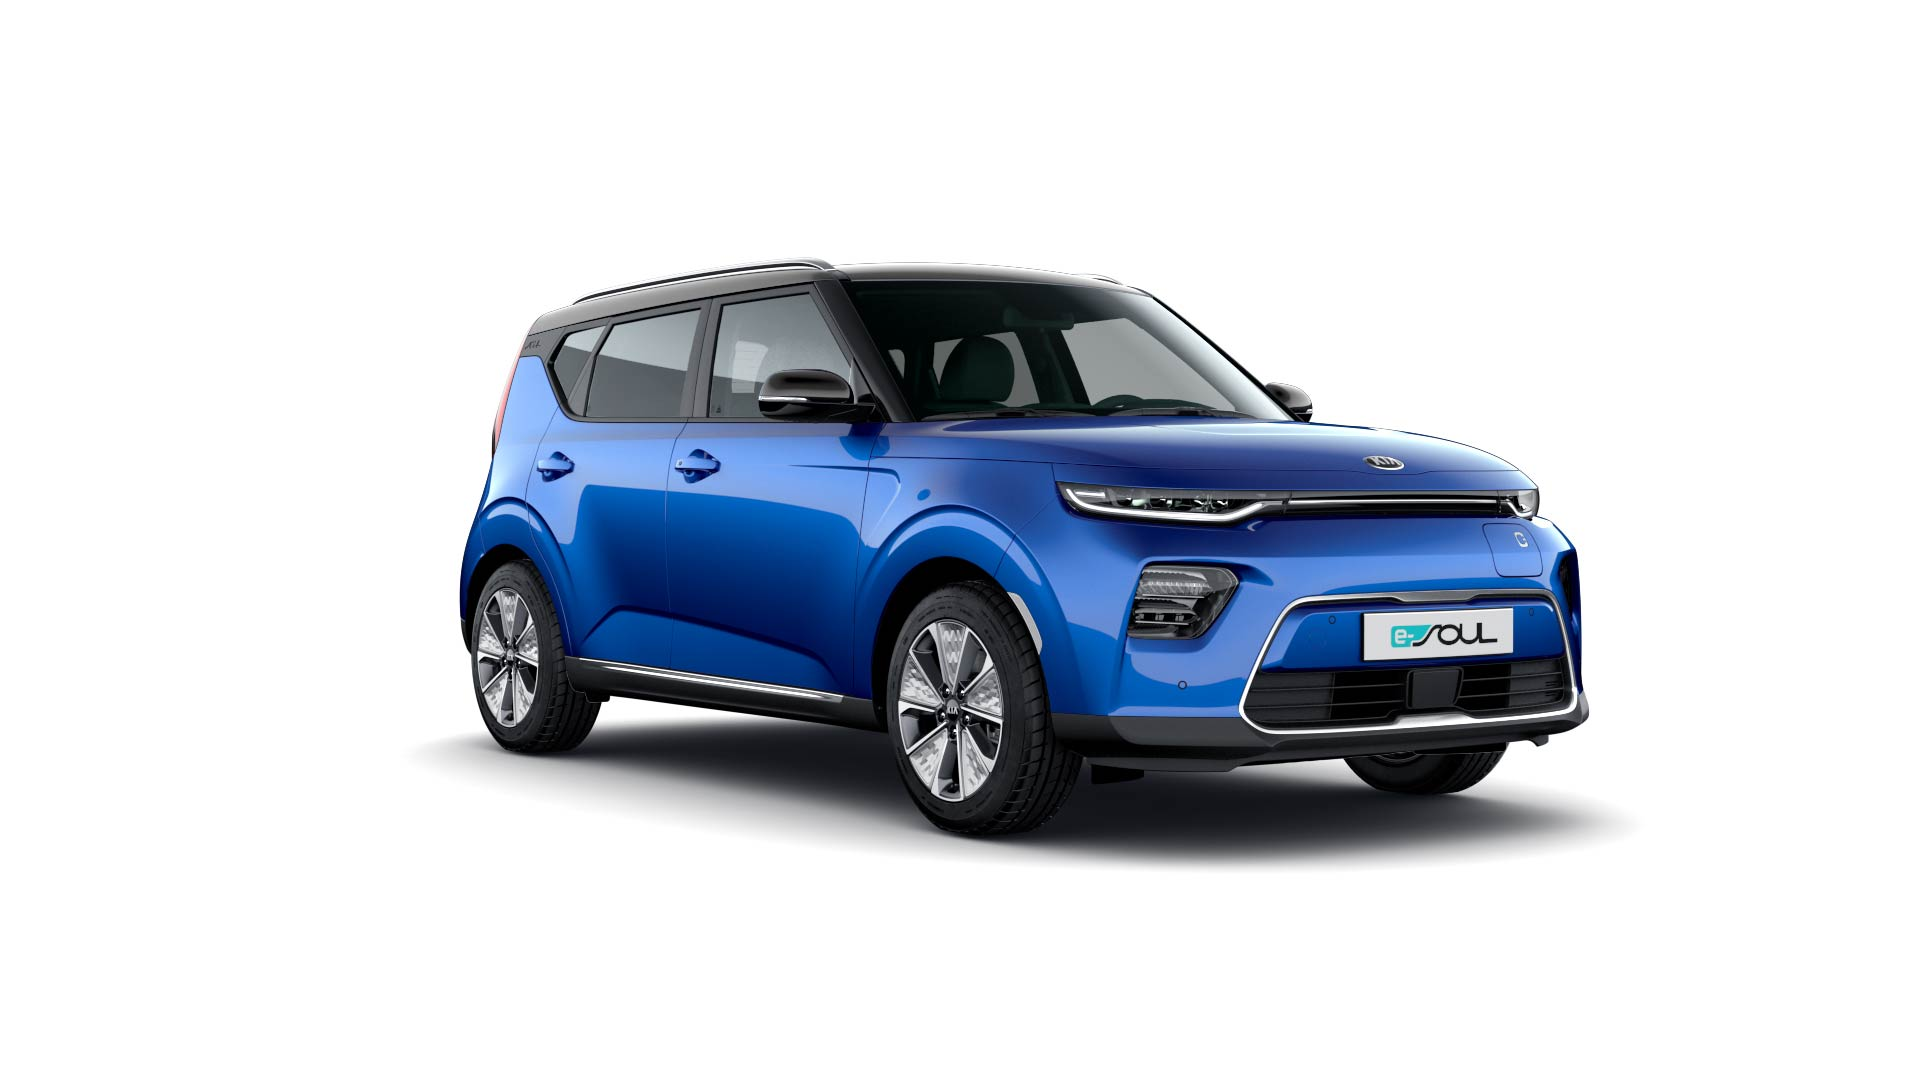 Kia e-Soul Auto Stahl Seitenansicht Blau Elektro